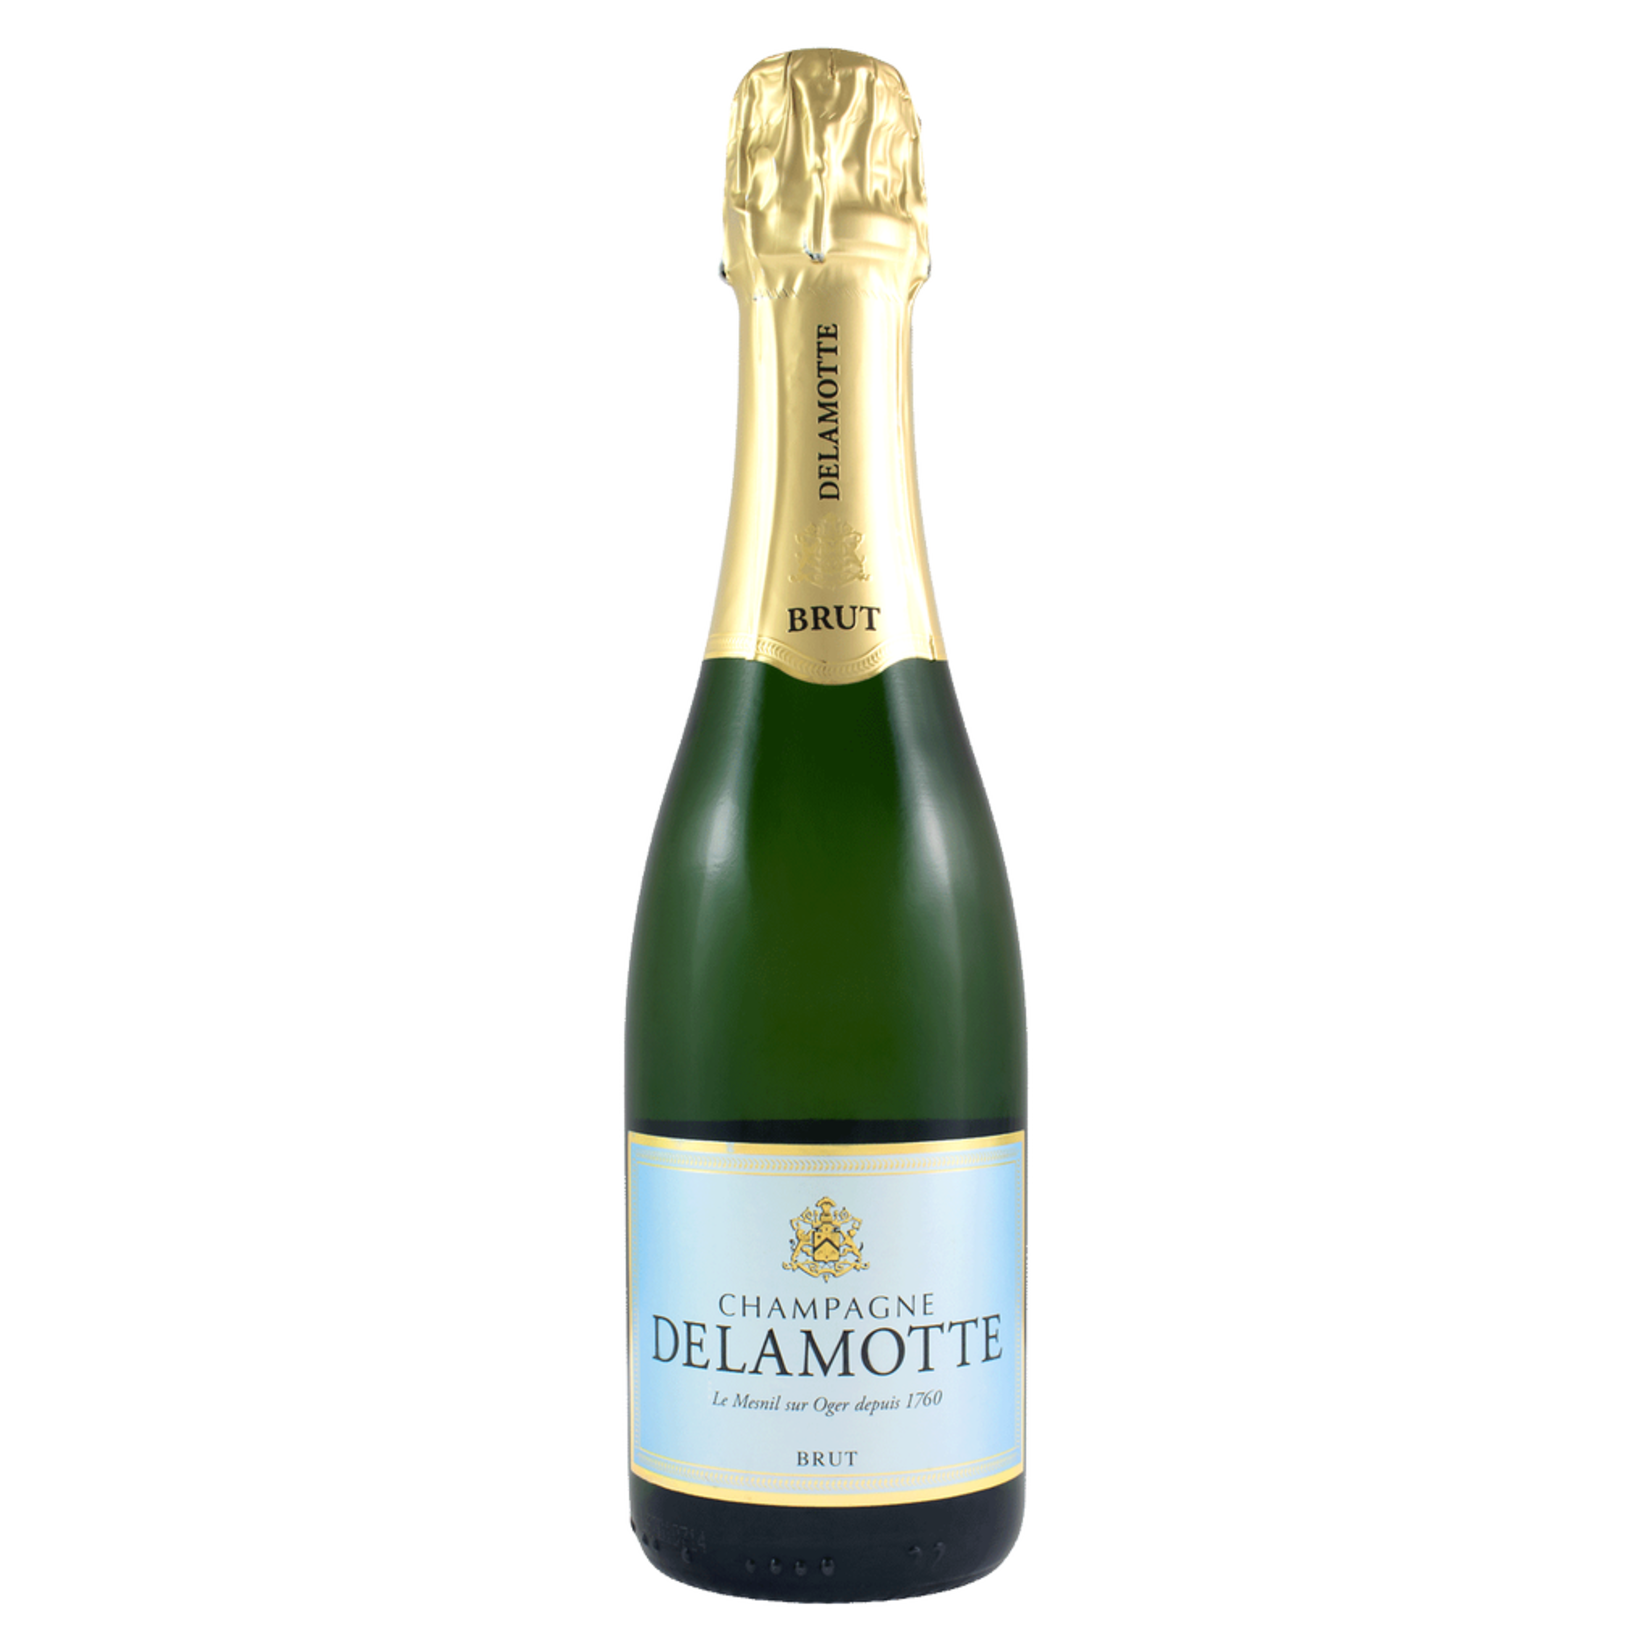 Delamotte Champagne Brut 375ml